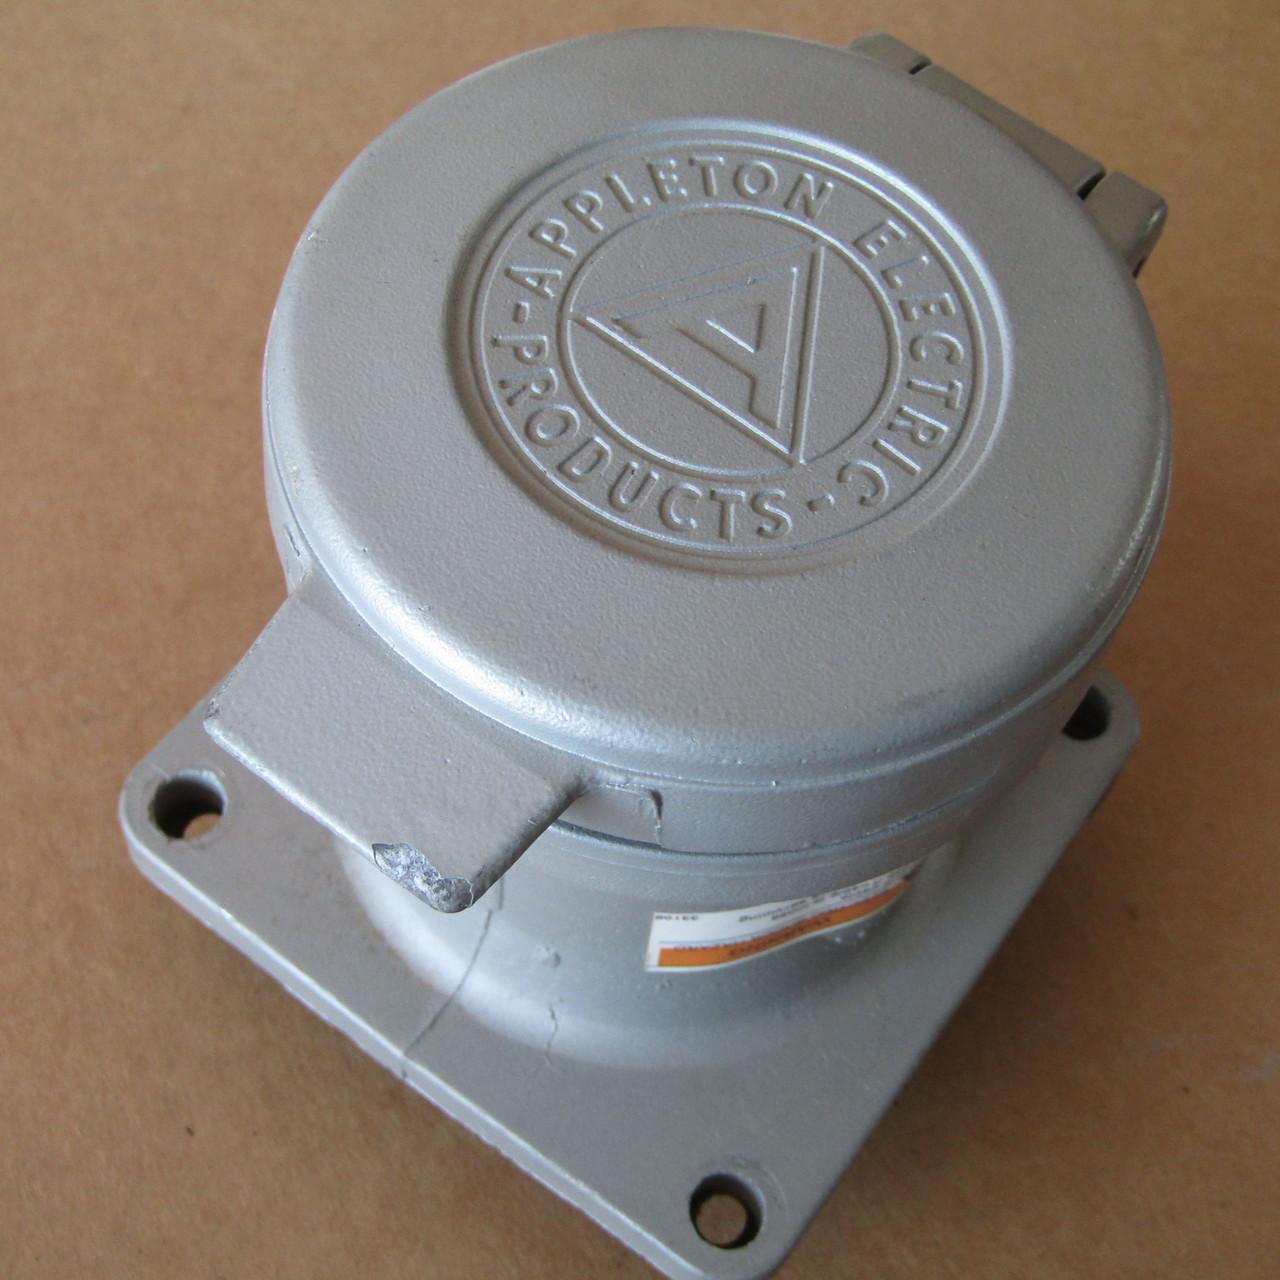 Appleton ADR6034 Powertite Receptacle 60A 3W 4P 600VAC - Used